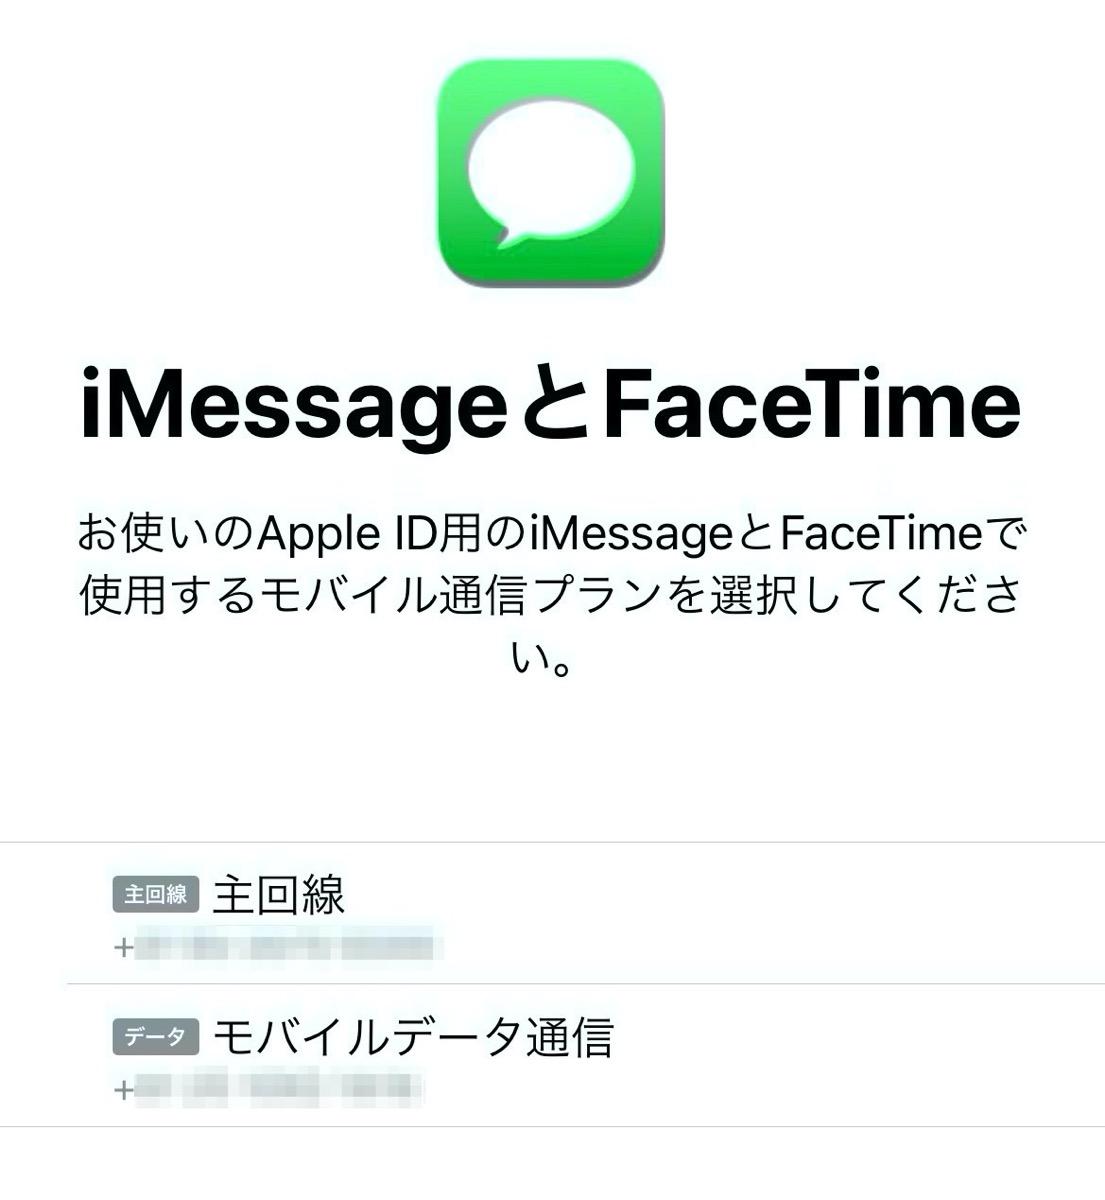 eSIM iMessage FaceTime